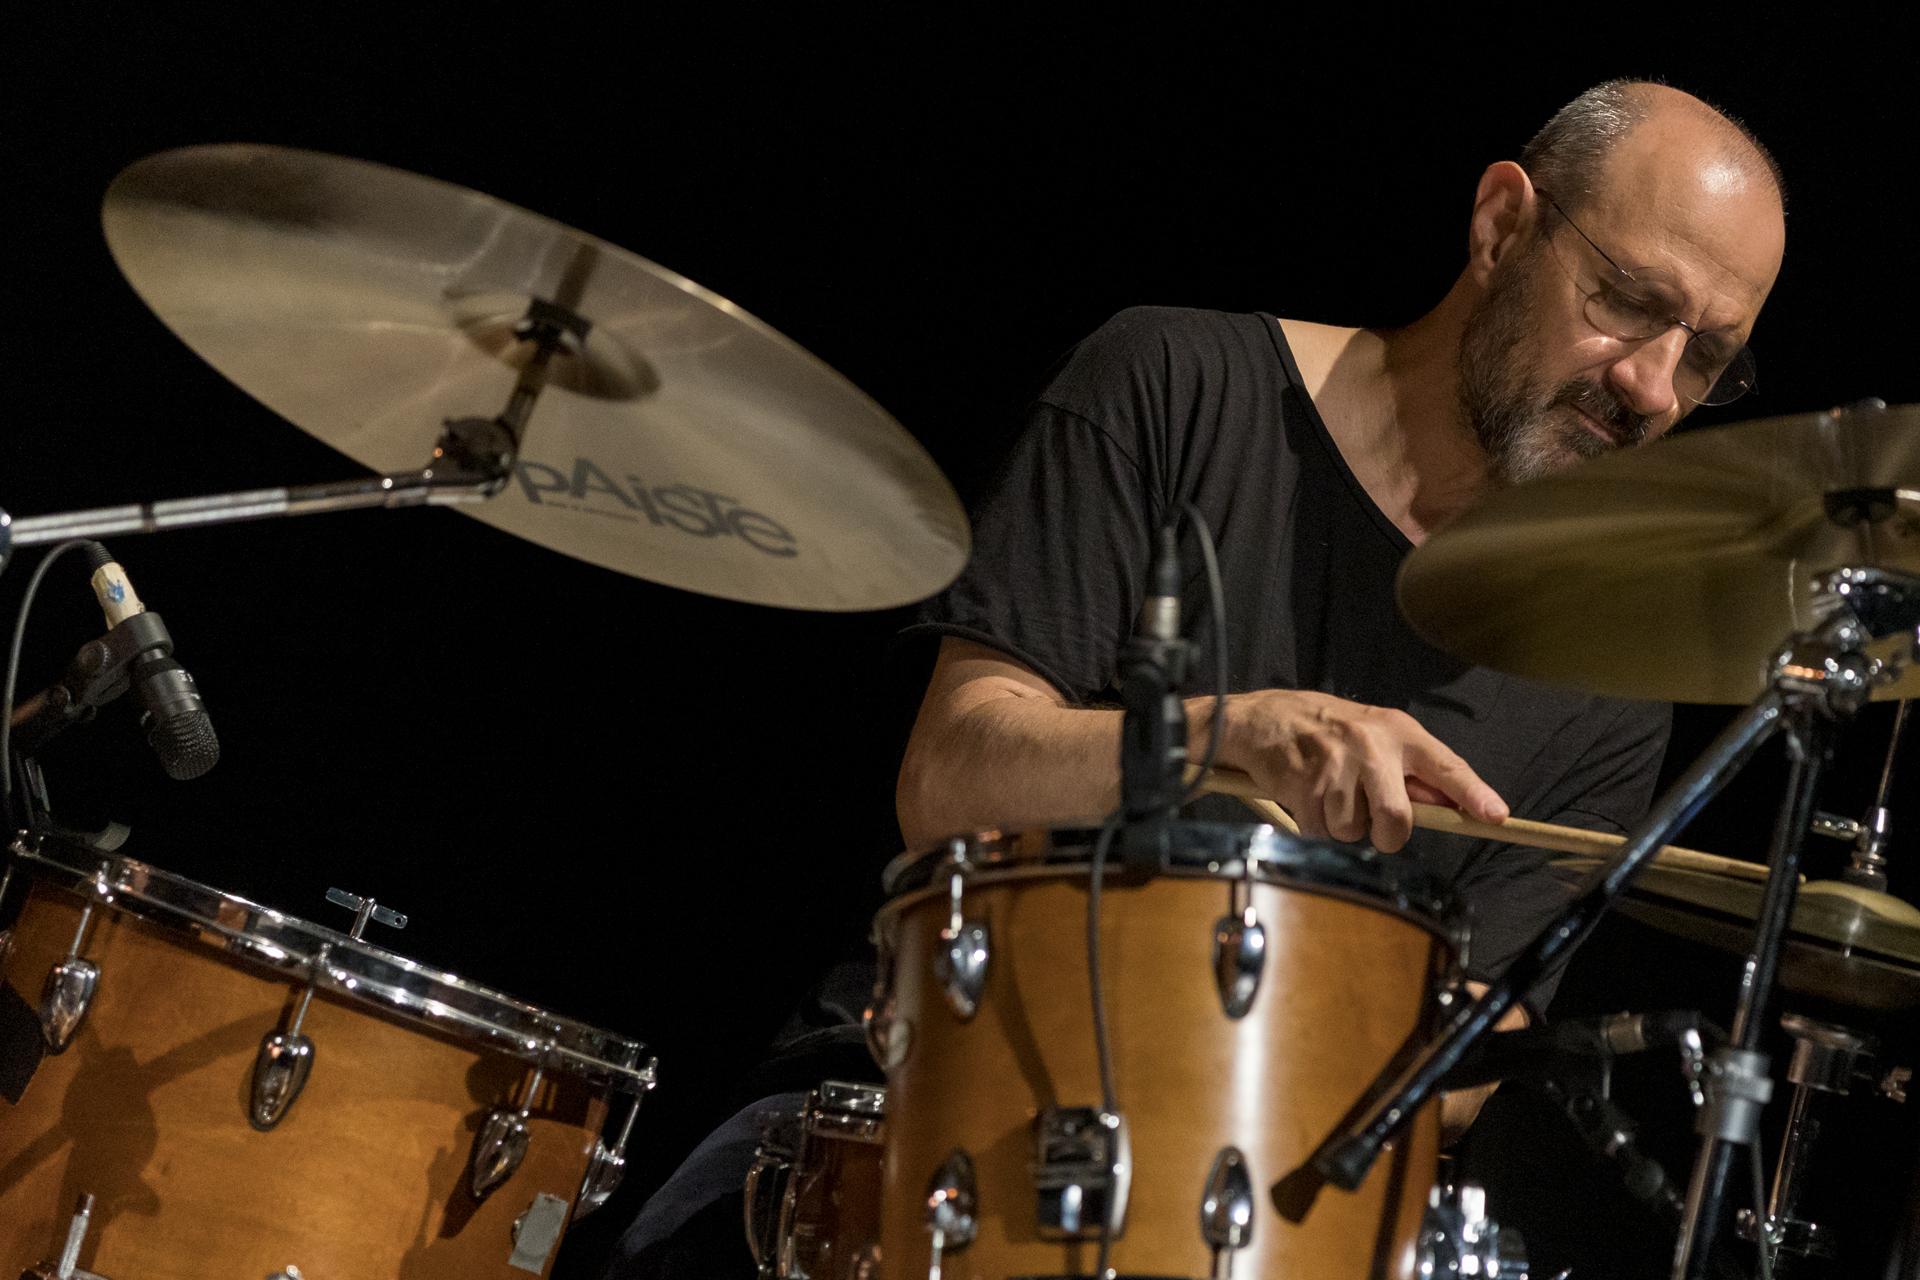 2019_09_13-Iverson-Sanders-Rossy-Trio-©-Luca-Vantusso-225807-EOSR6814